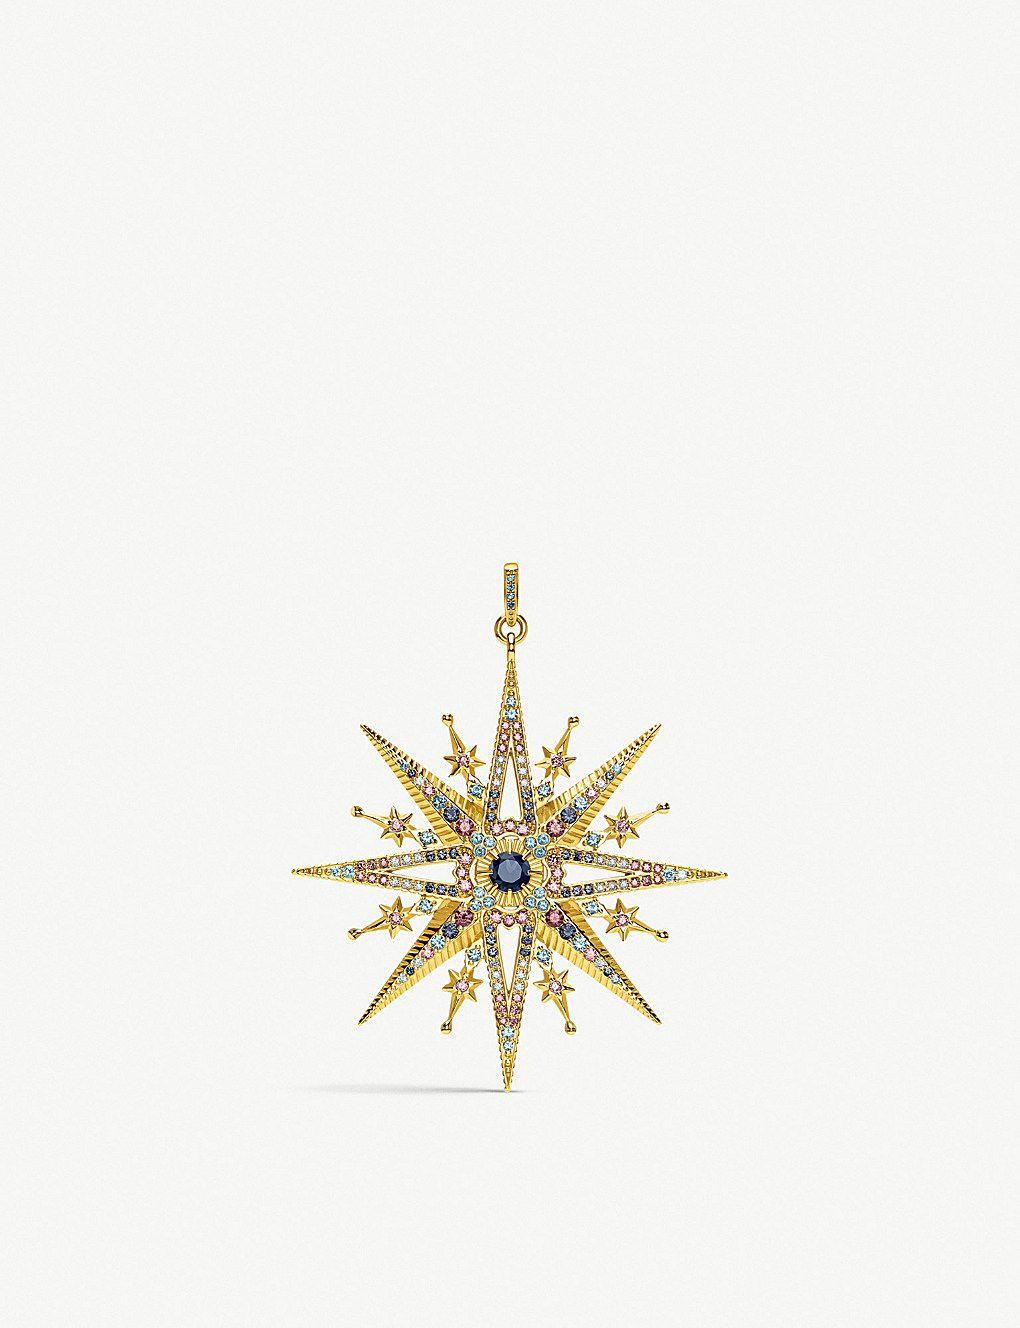 117c2dcc0 THOMAS SABO - Kingdom of Dreams Royalty Star 18ct gold-plated pendant |  Selfridges.com